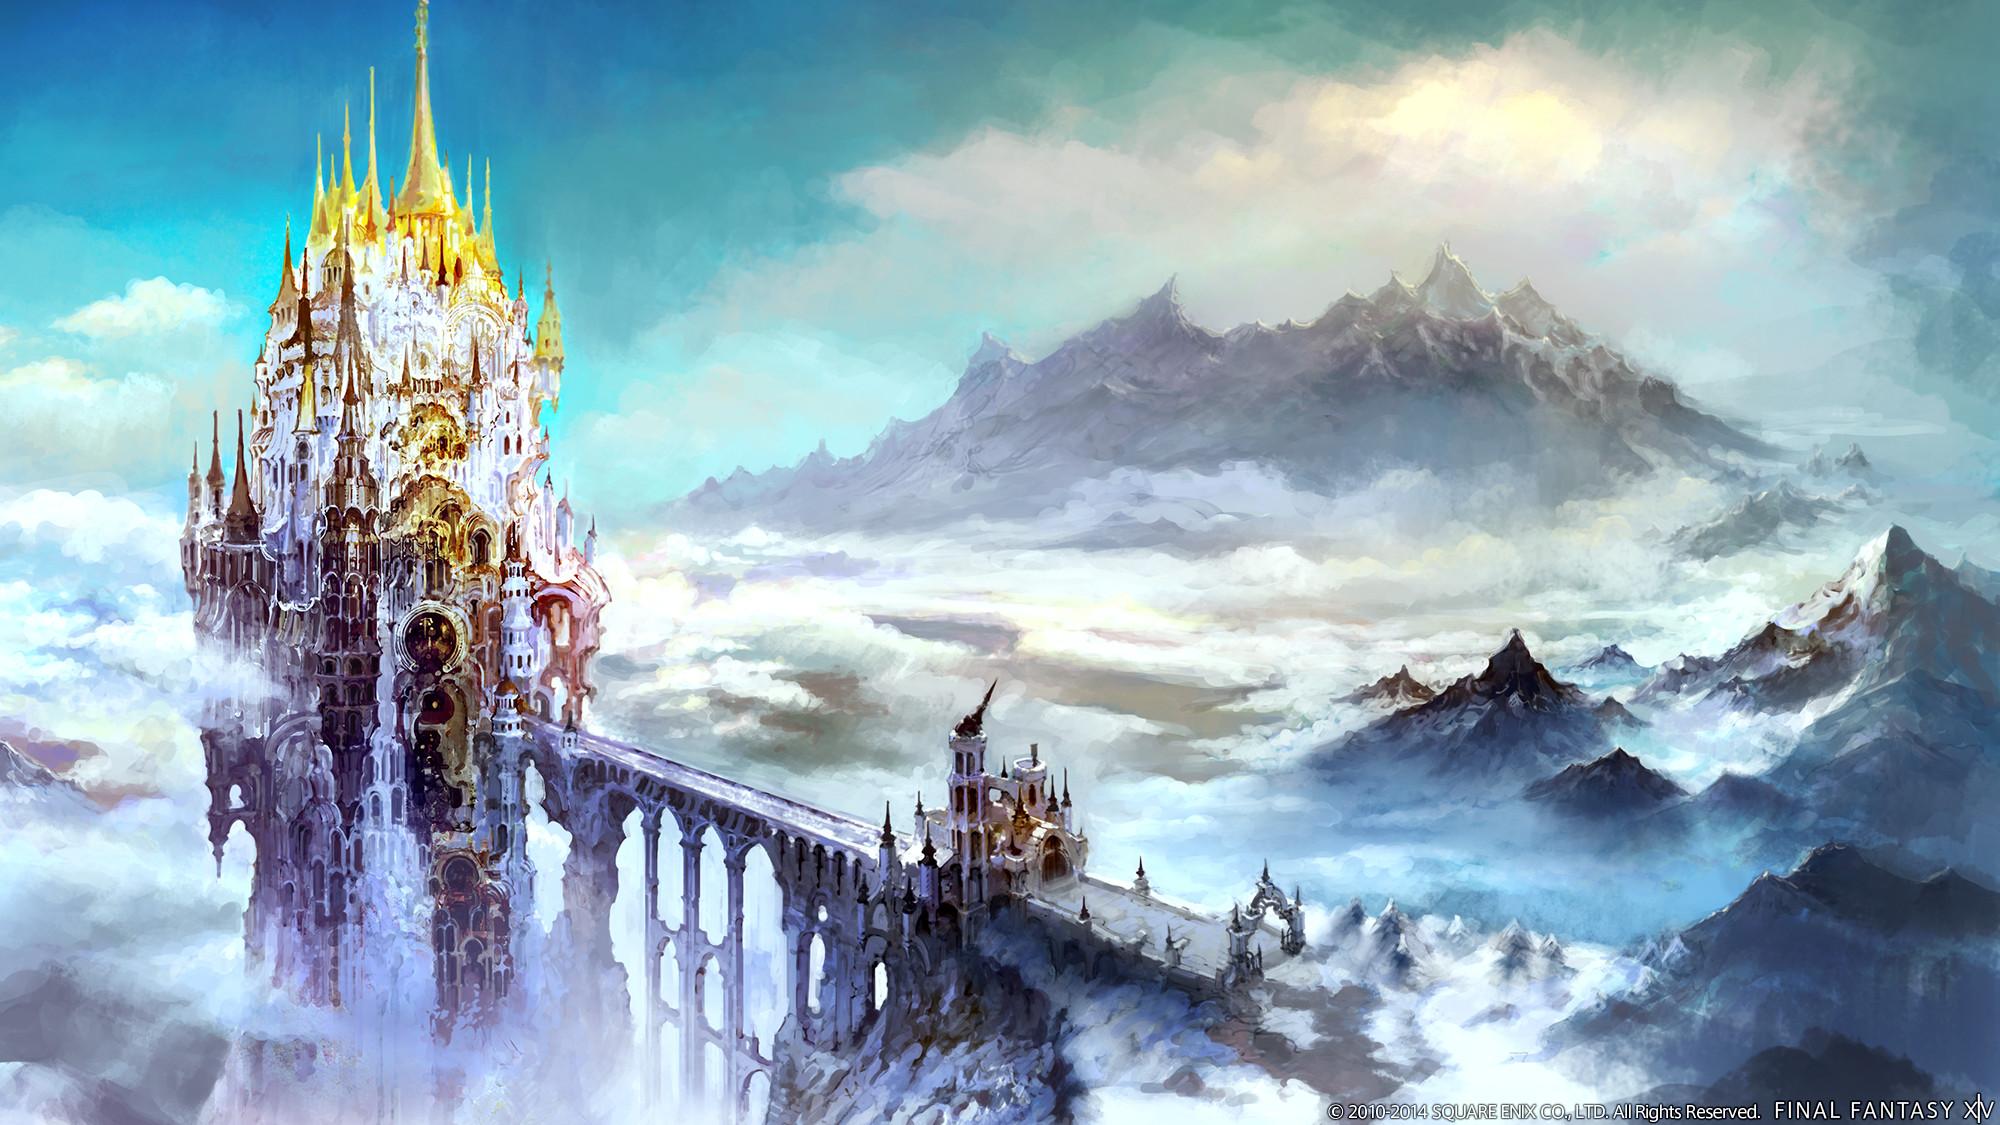 Final Fantasy XIII HD desktop wallpaper High Definition